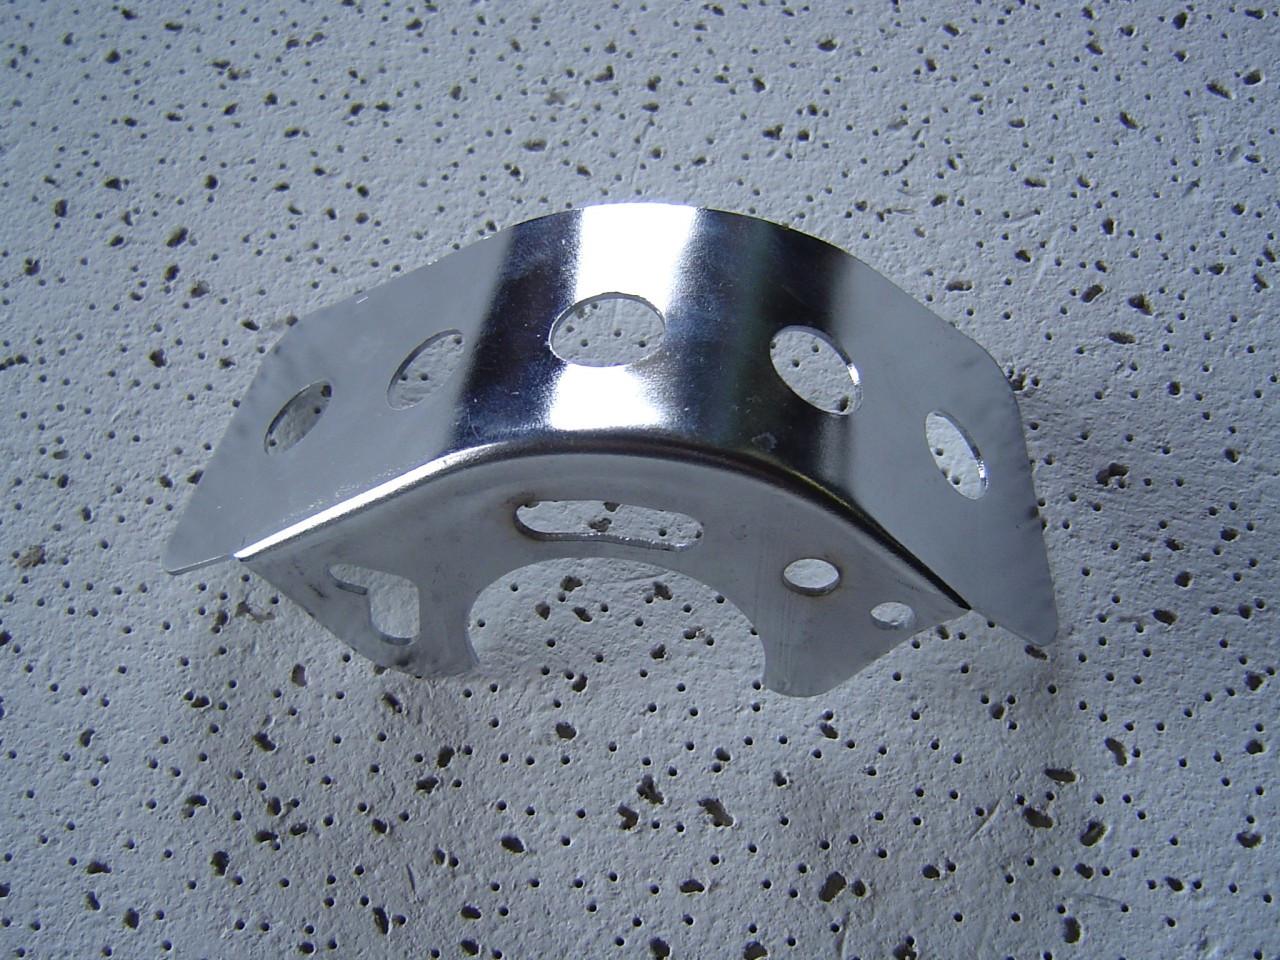 Universal Chrome Clutch Guard Chain Deflector Old